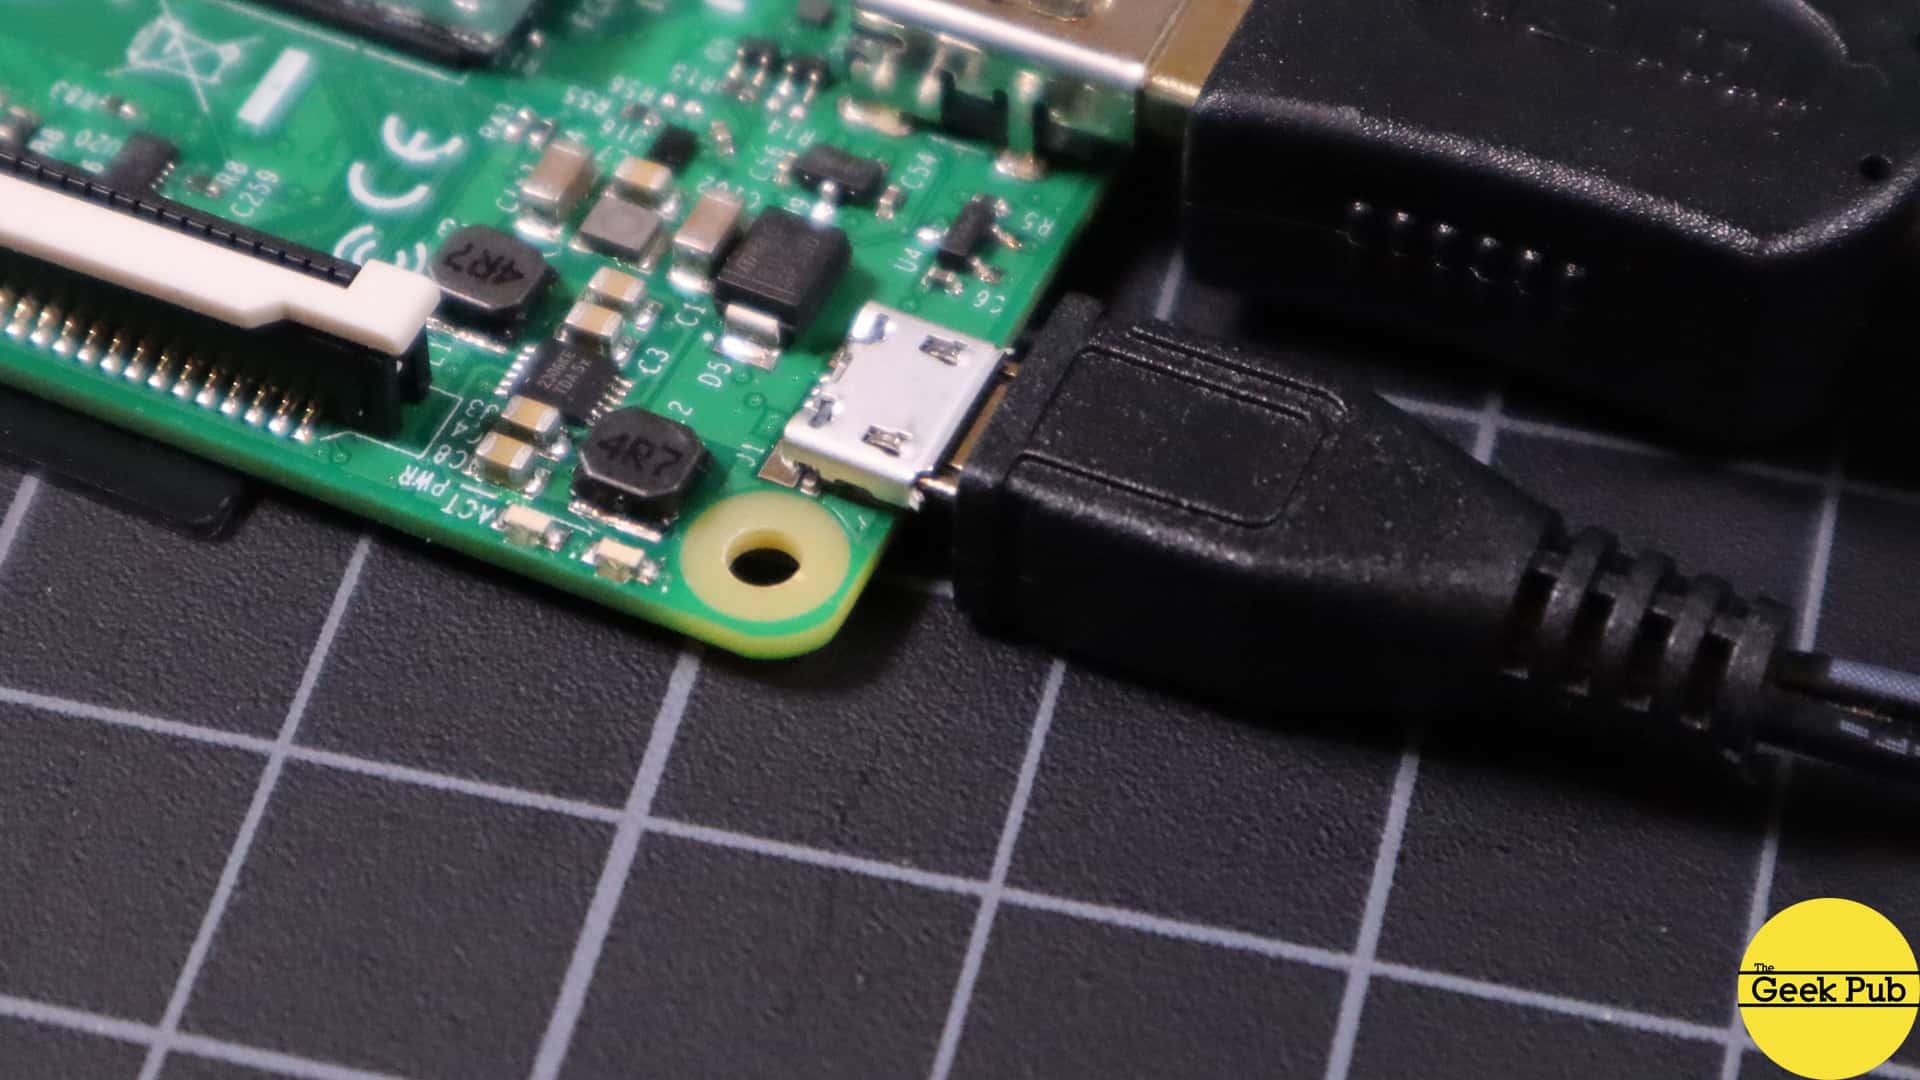 How to install Raspbian on the Raspberry Pi - The Geek Pub